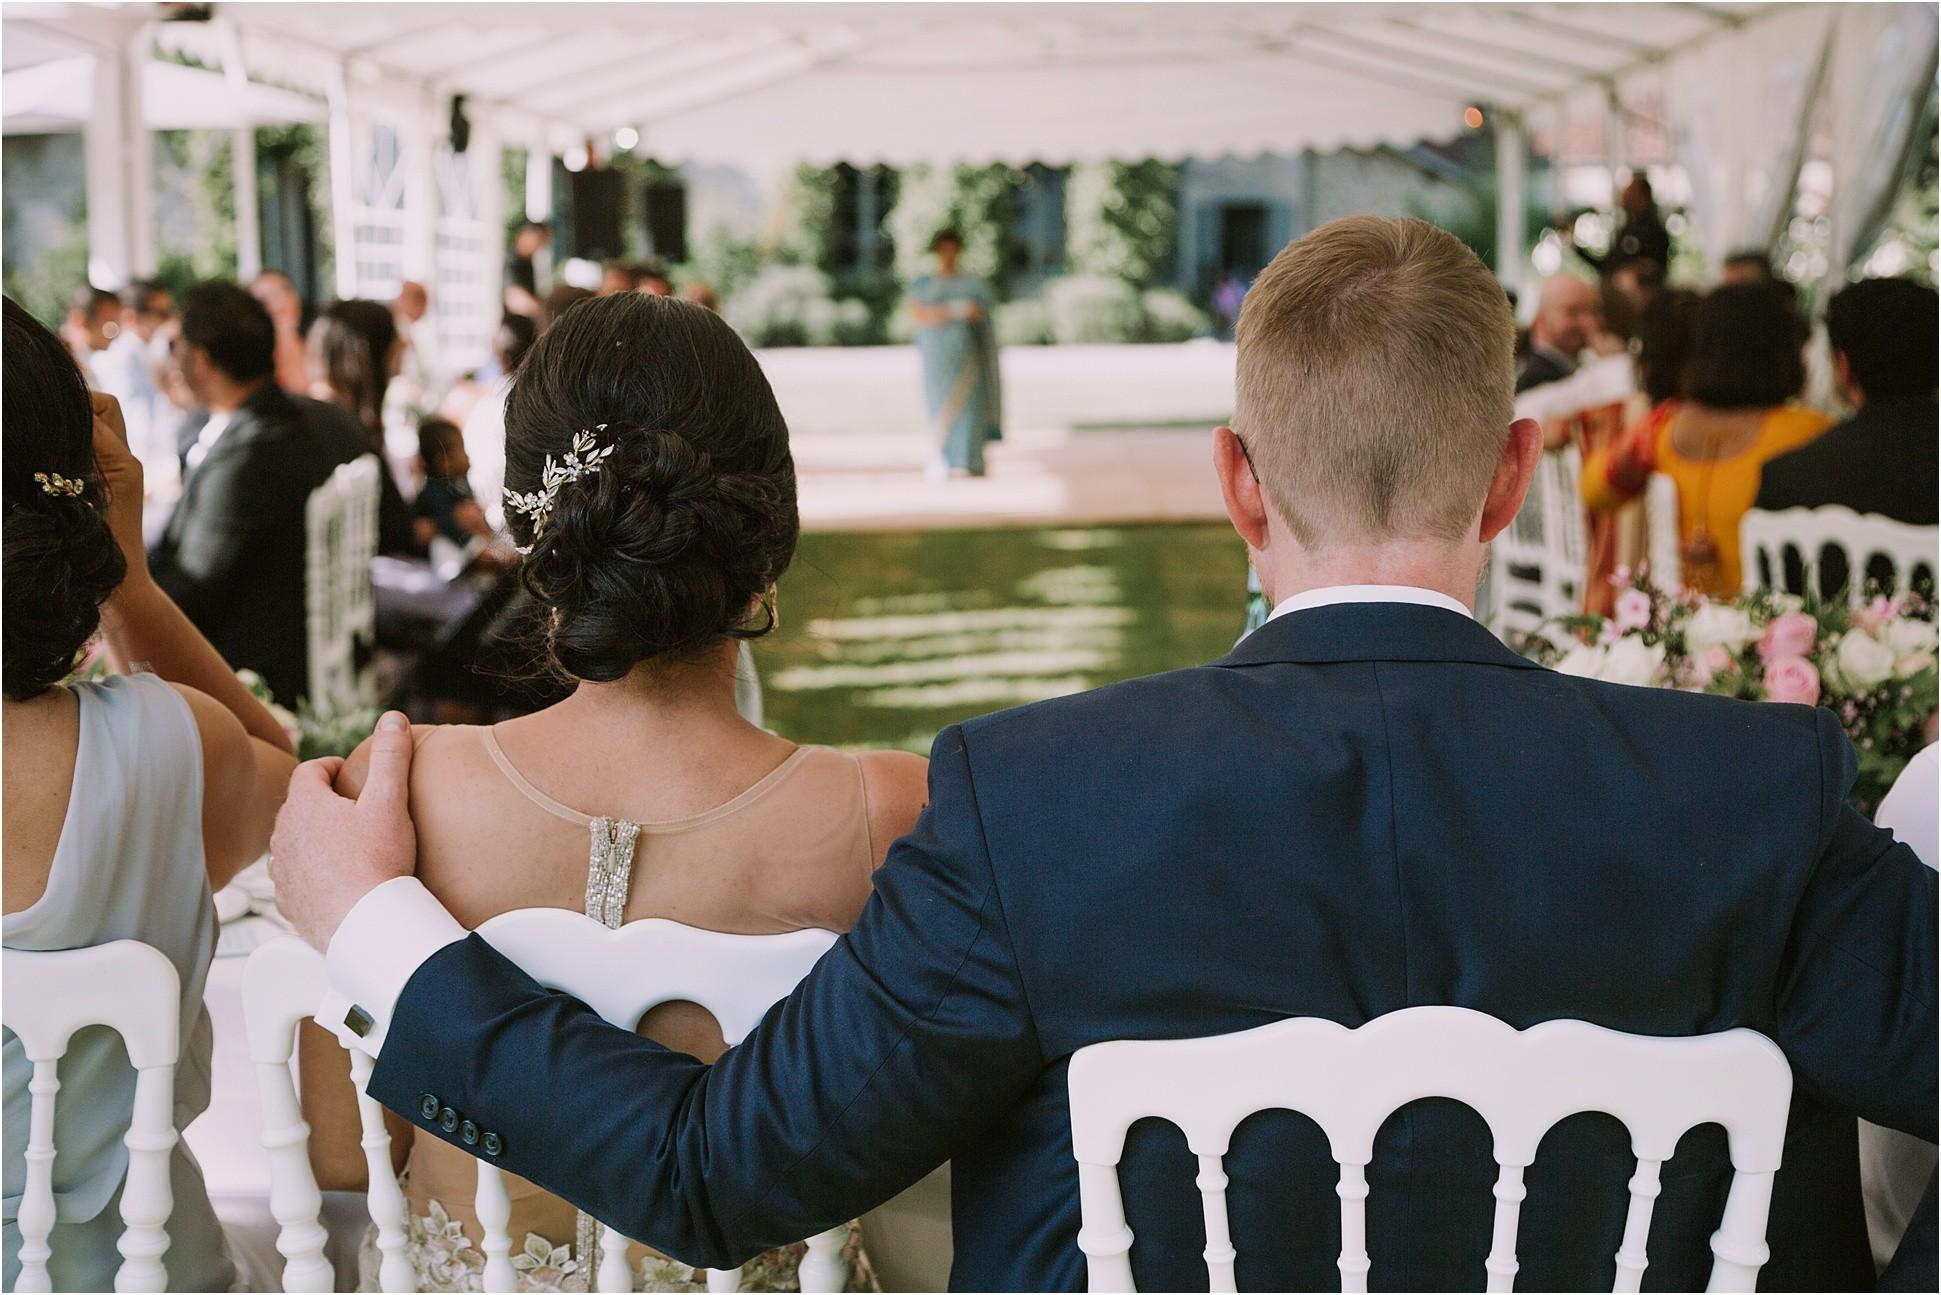 Kateryna-photos-photographe-mariage-chateau-st-paterne-mayenne-normandie_0154.jpg